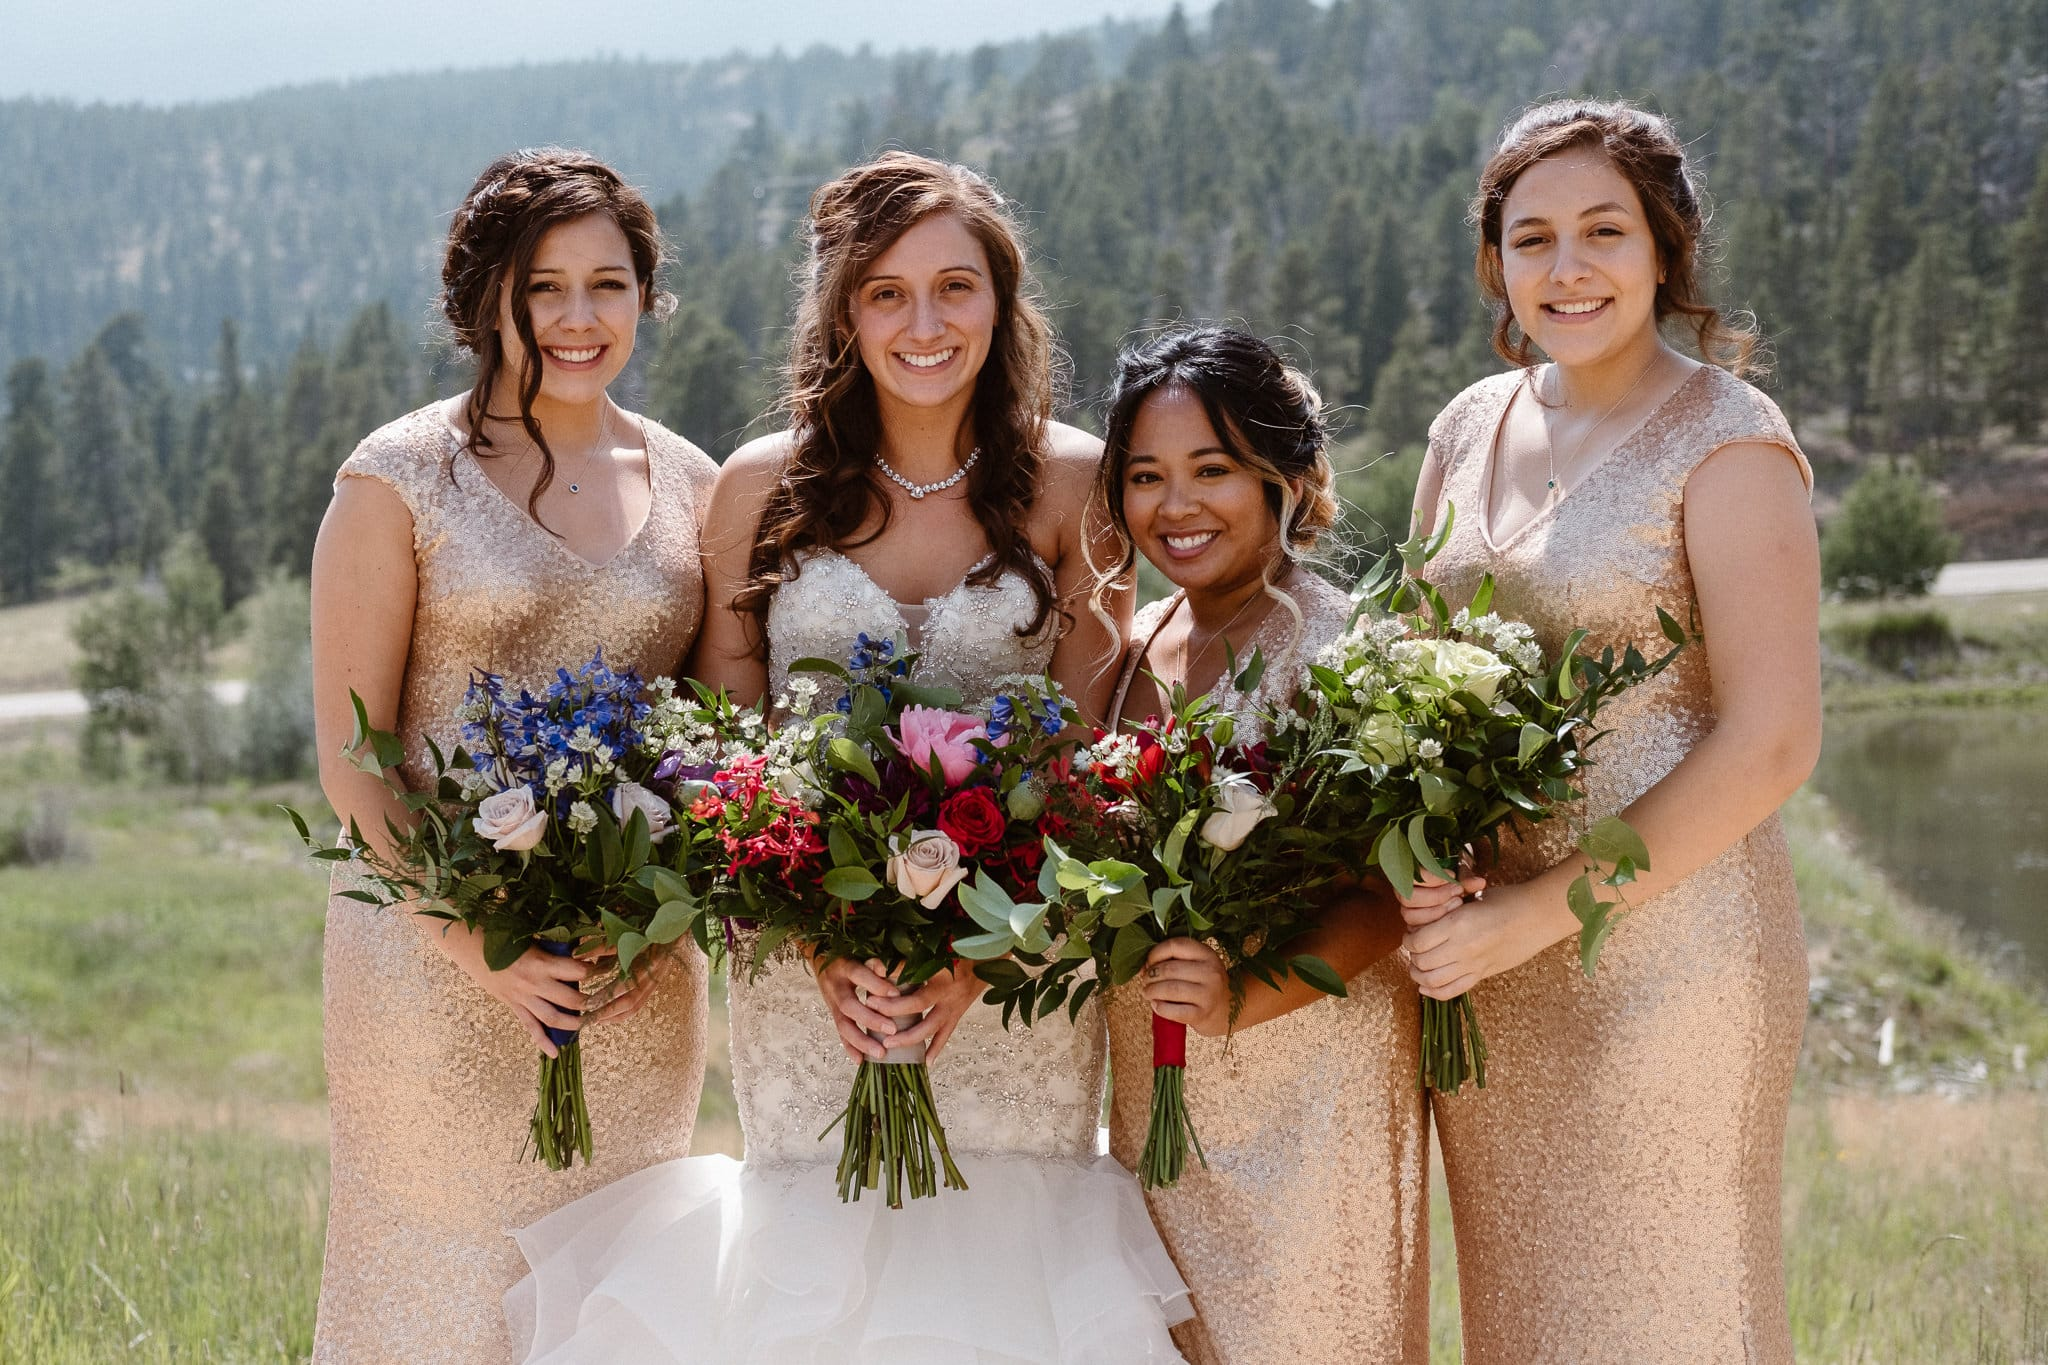 Dao House wedding photographer, Estes Park wedding venue, Colorado mountain wedding, bride and bridesmaids, gemstone colored wedding bouquets, gold sequin bridesmaids dresses